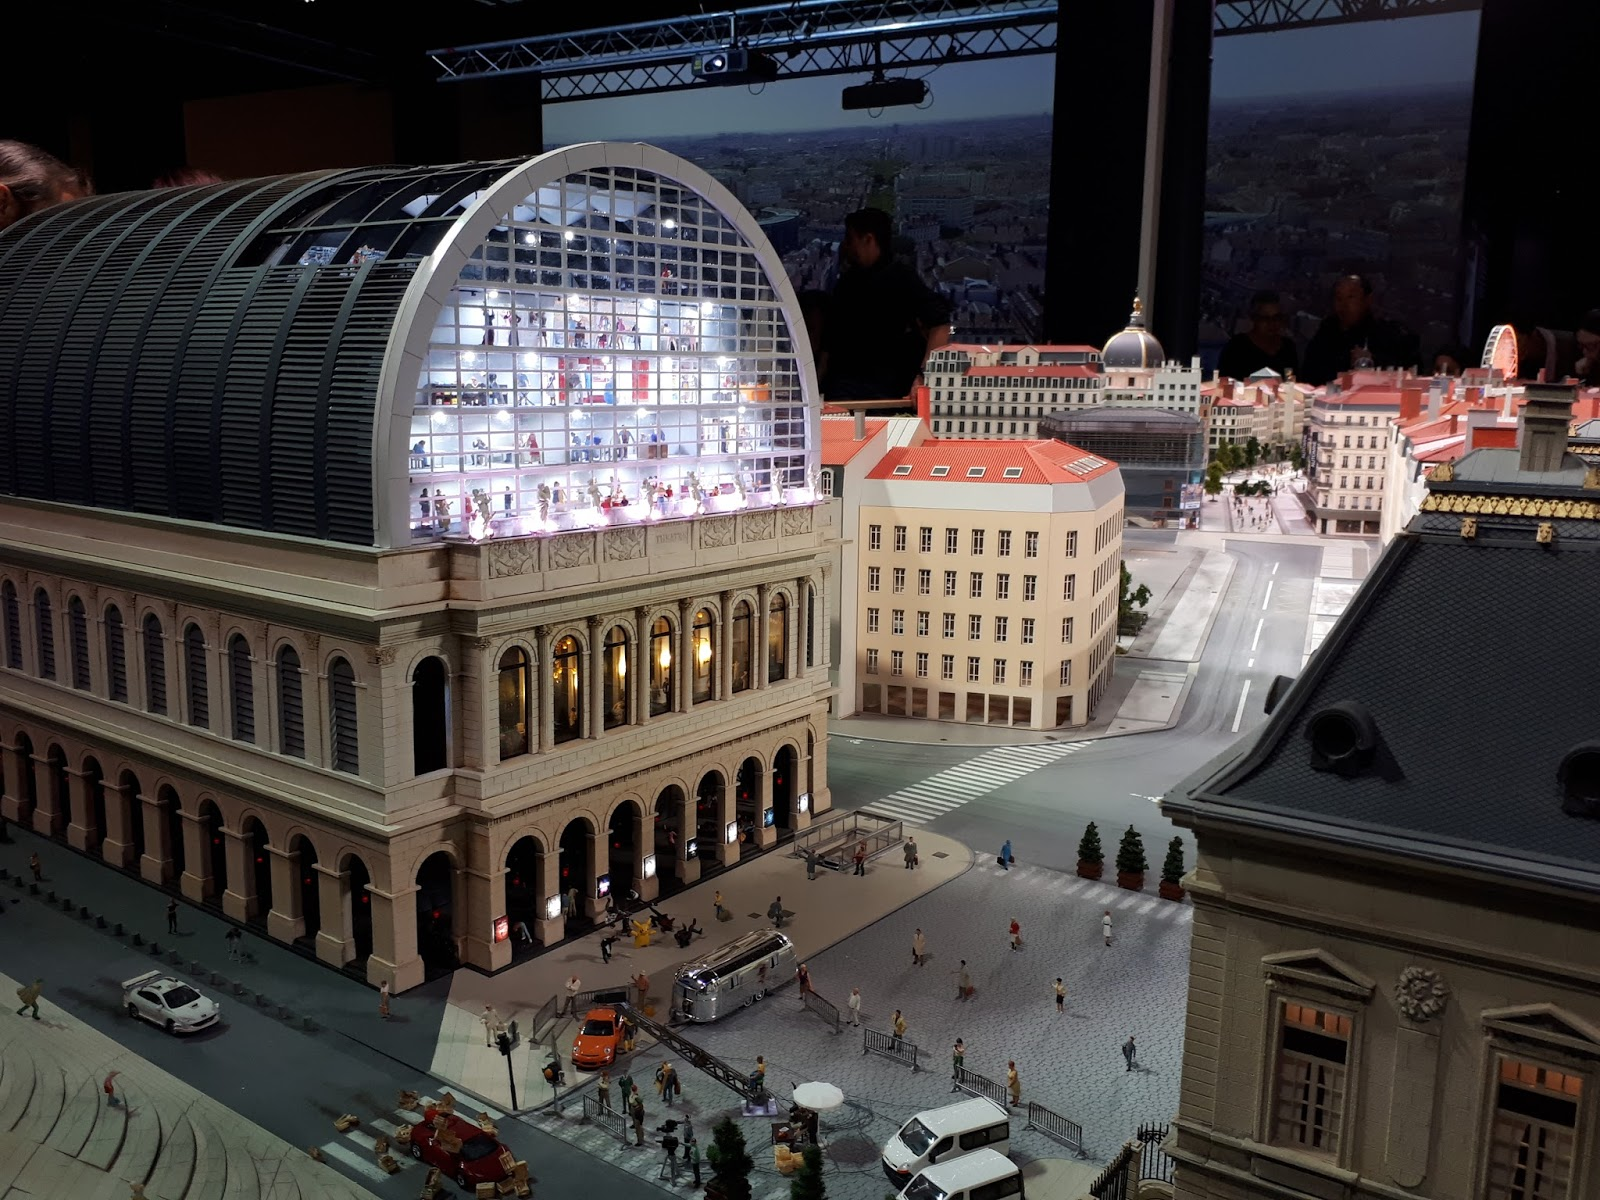 L'opéra de Lyon mini world